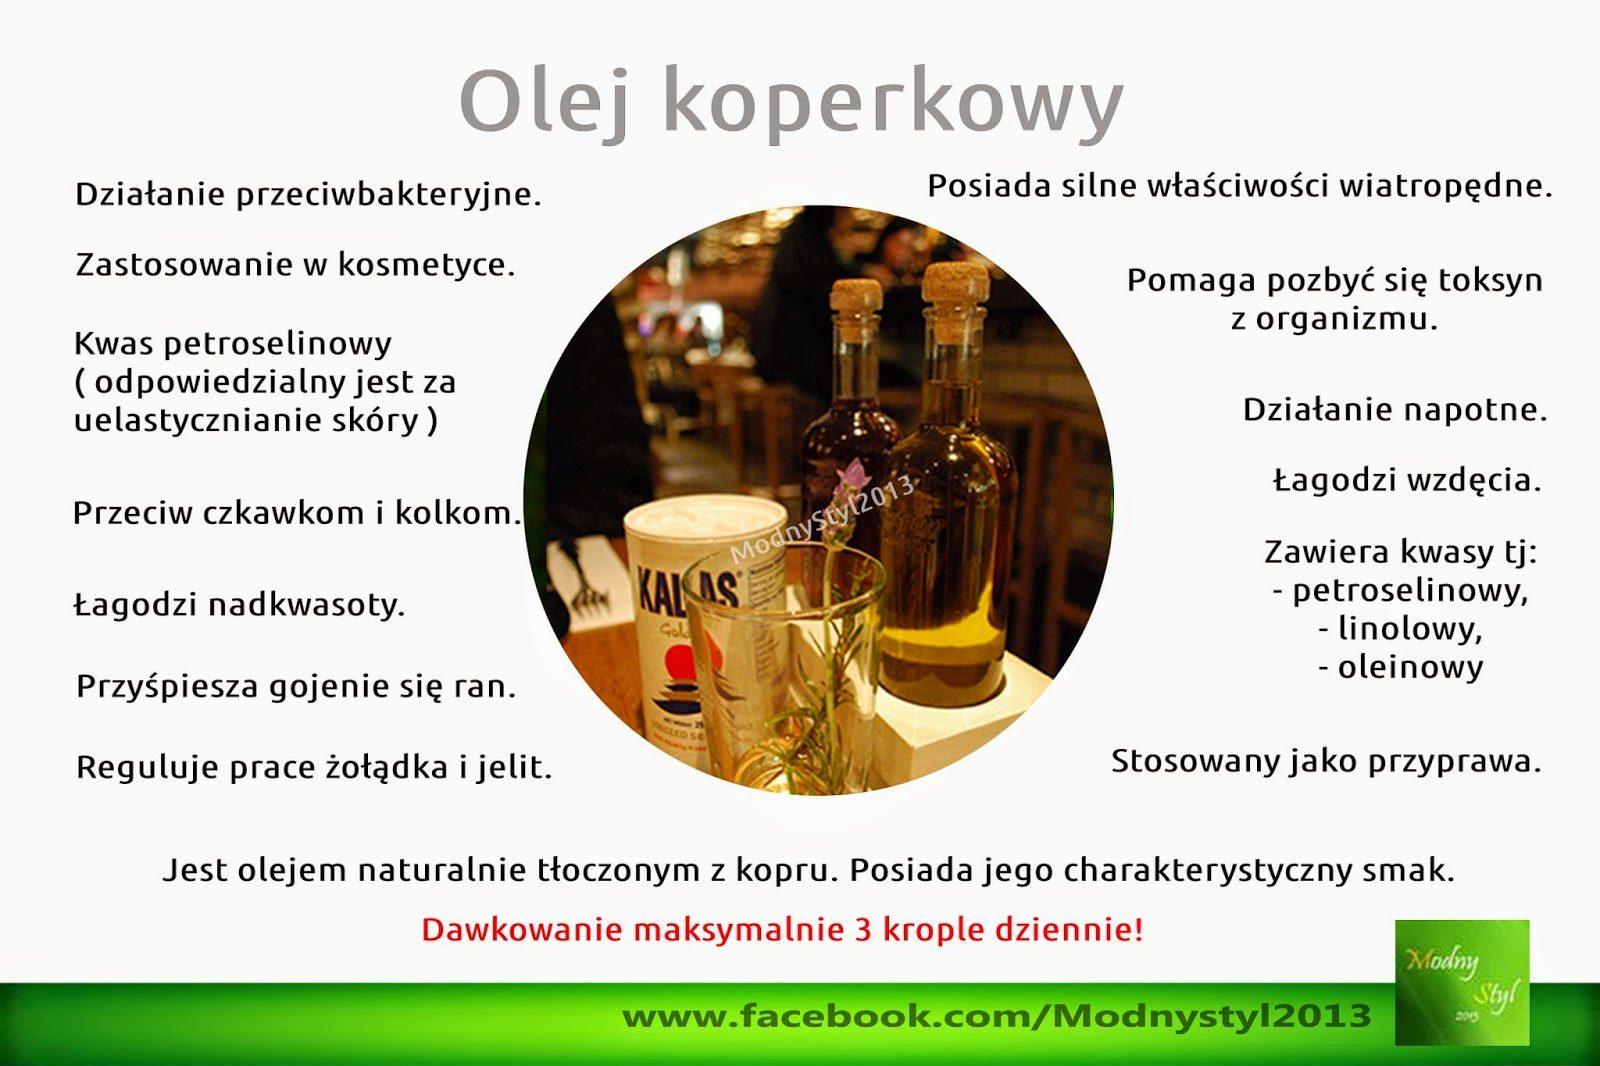 olej2bkoperkowy-6975567